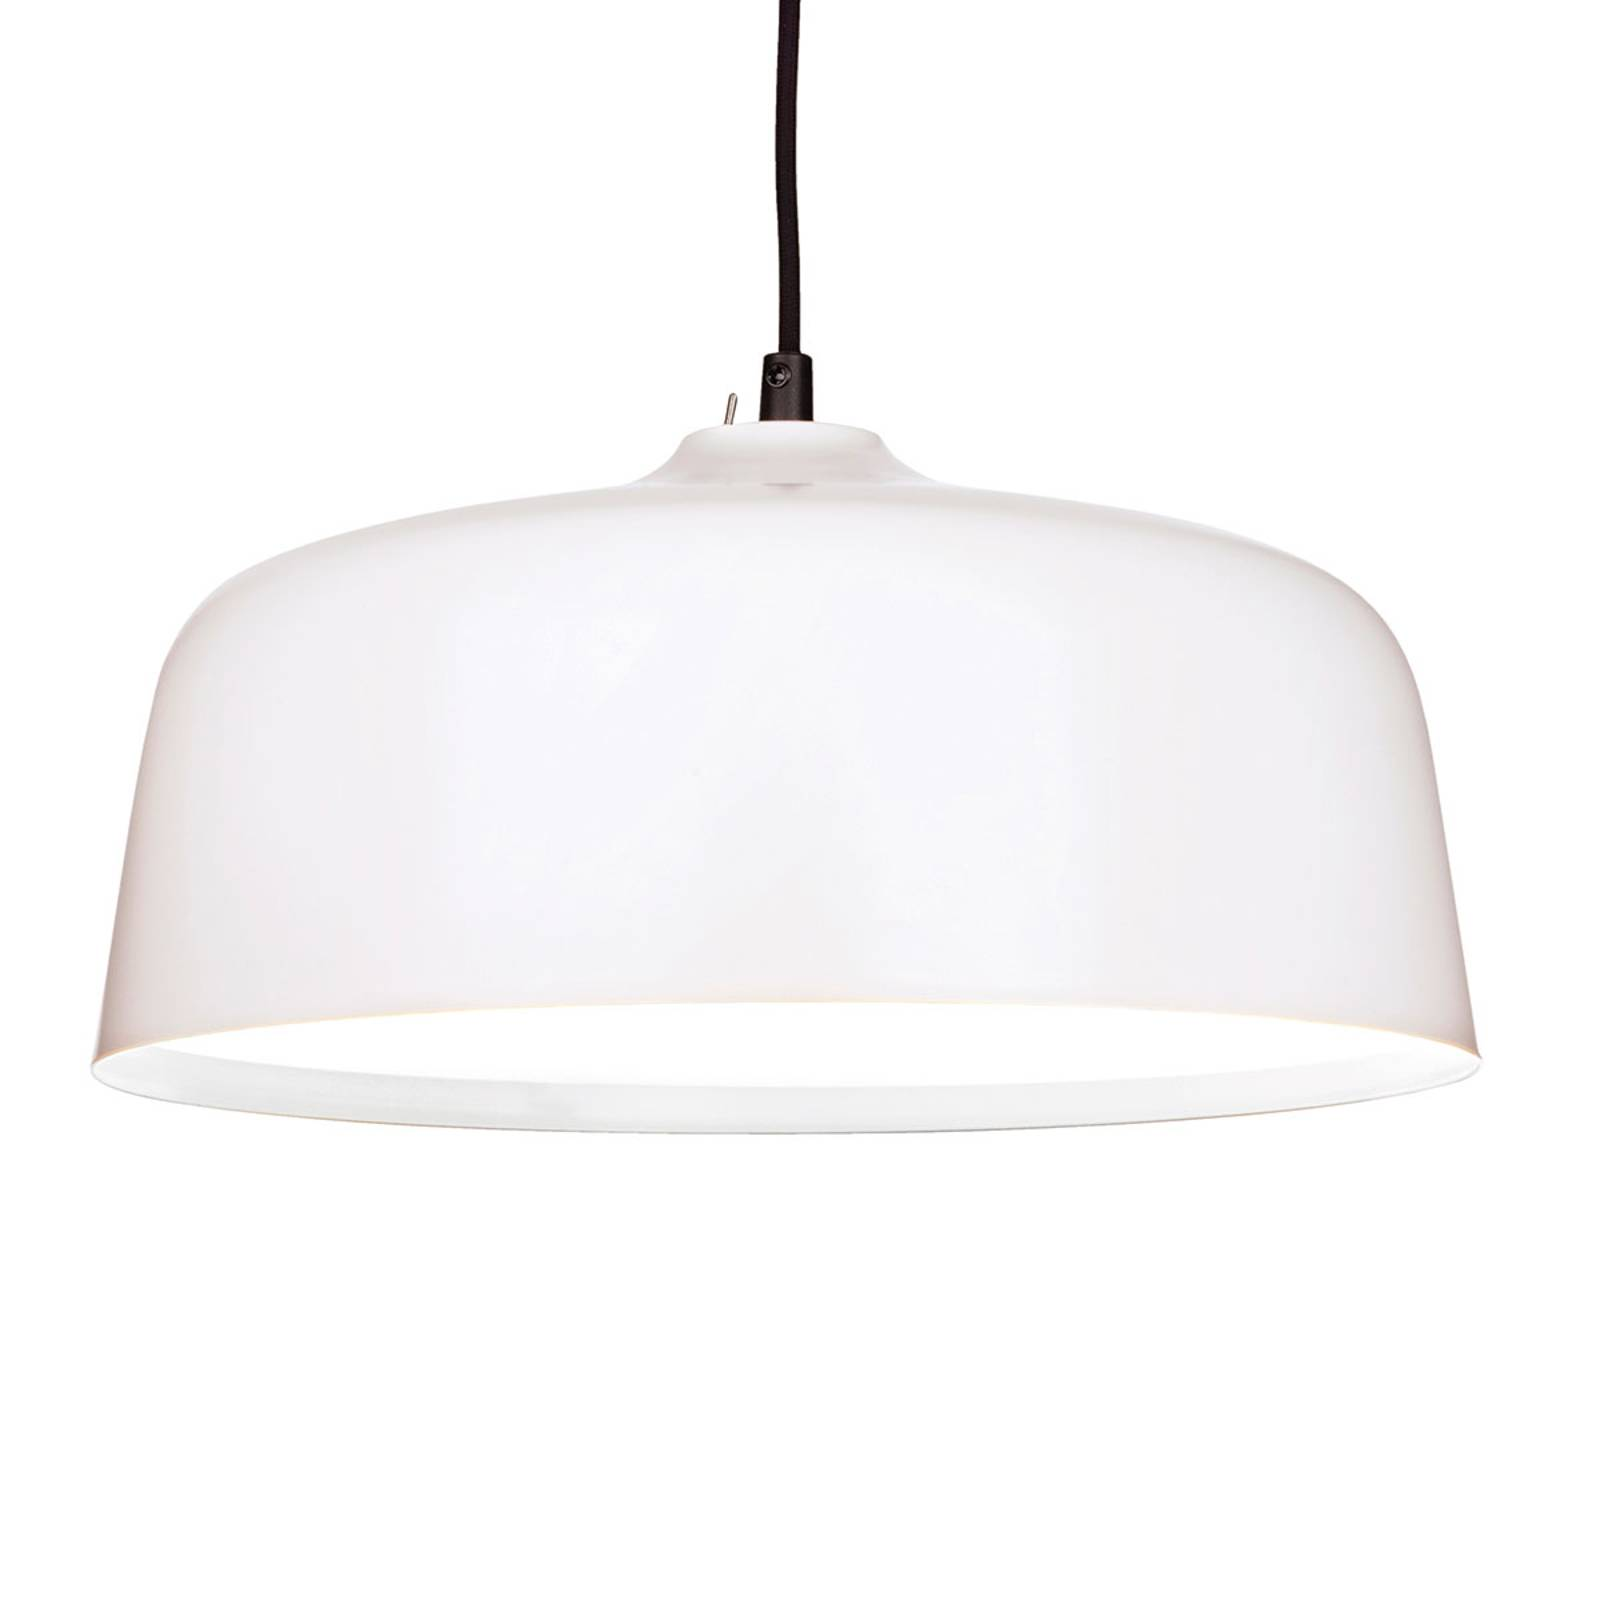 Innolux Candeo therapielicht-hanglamp wit